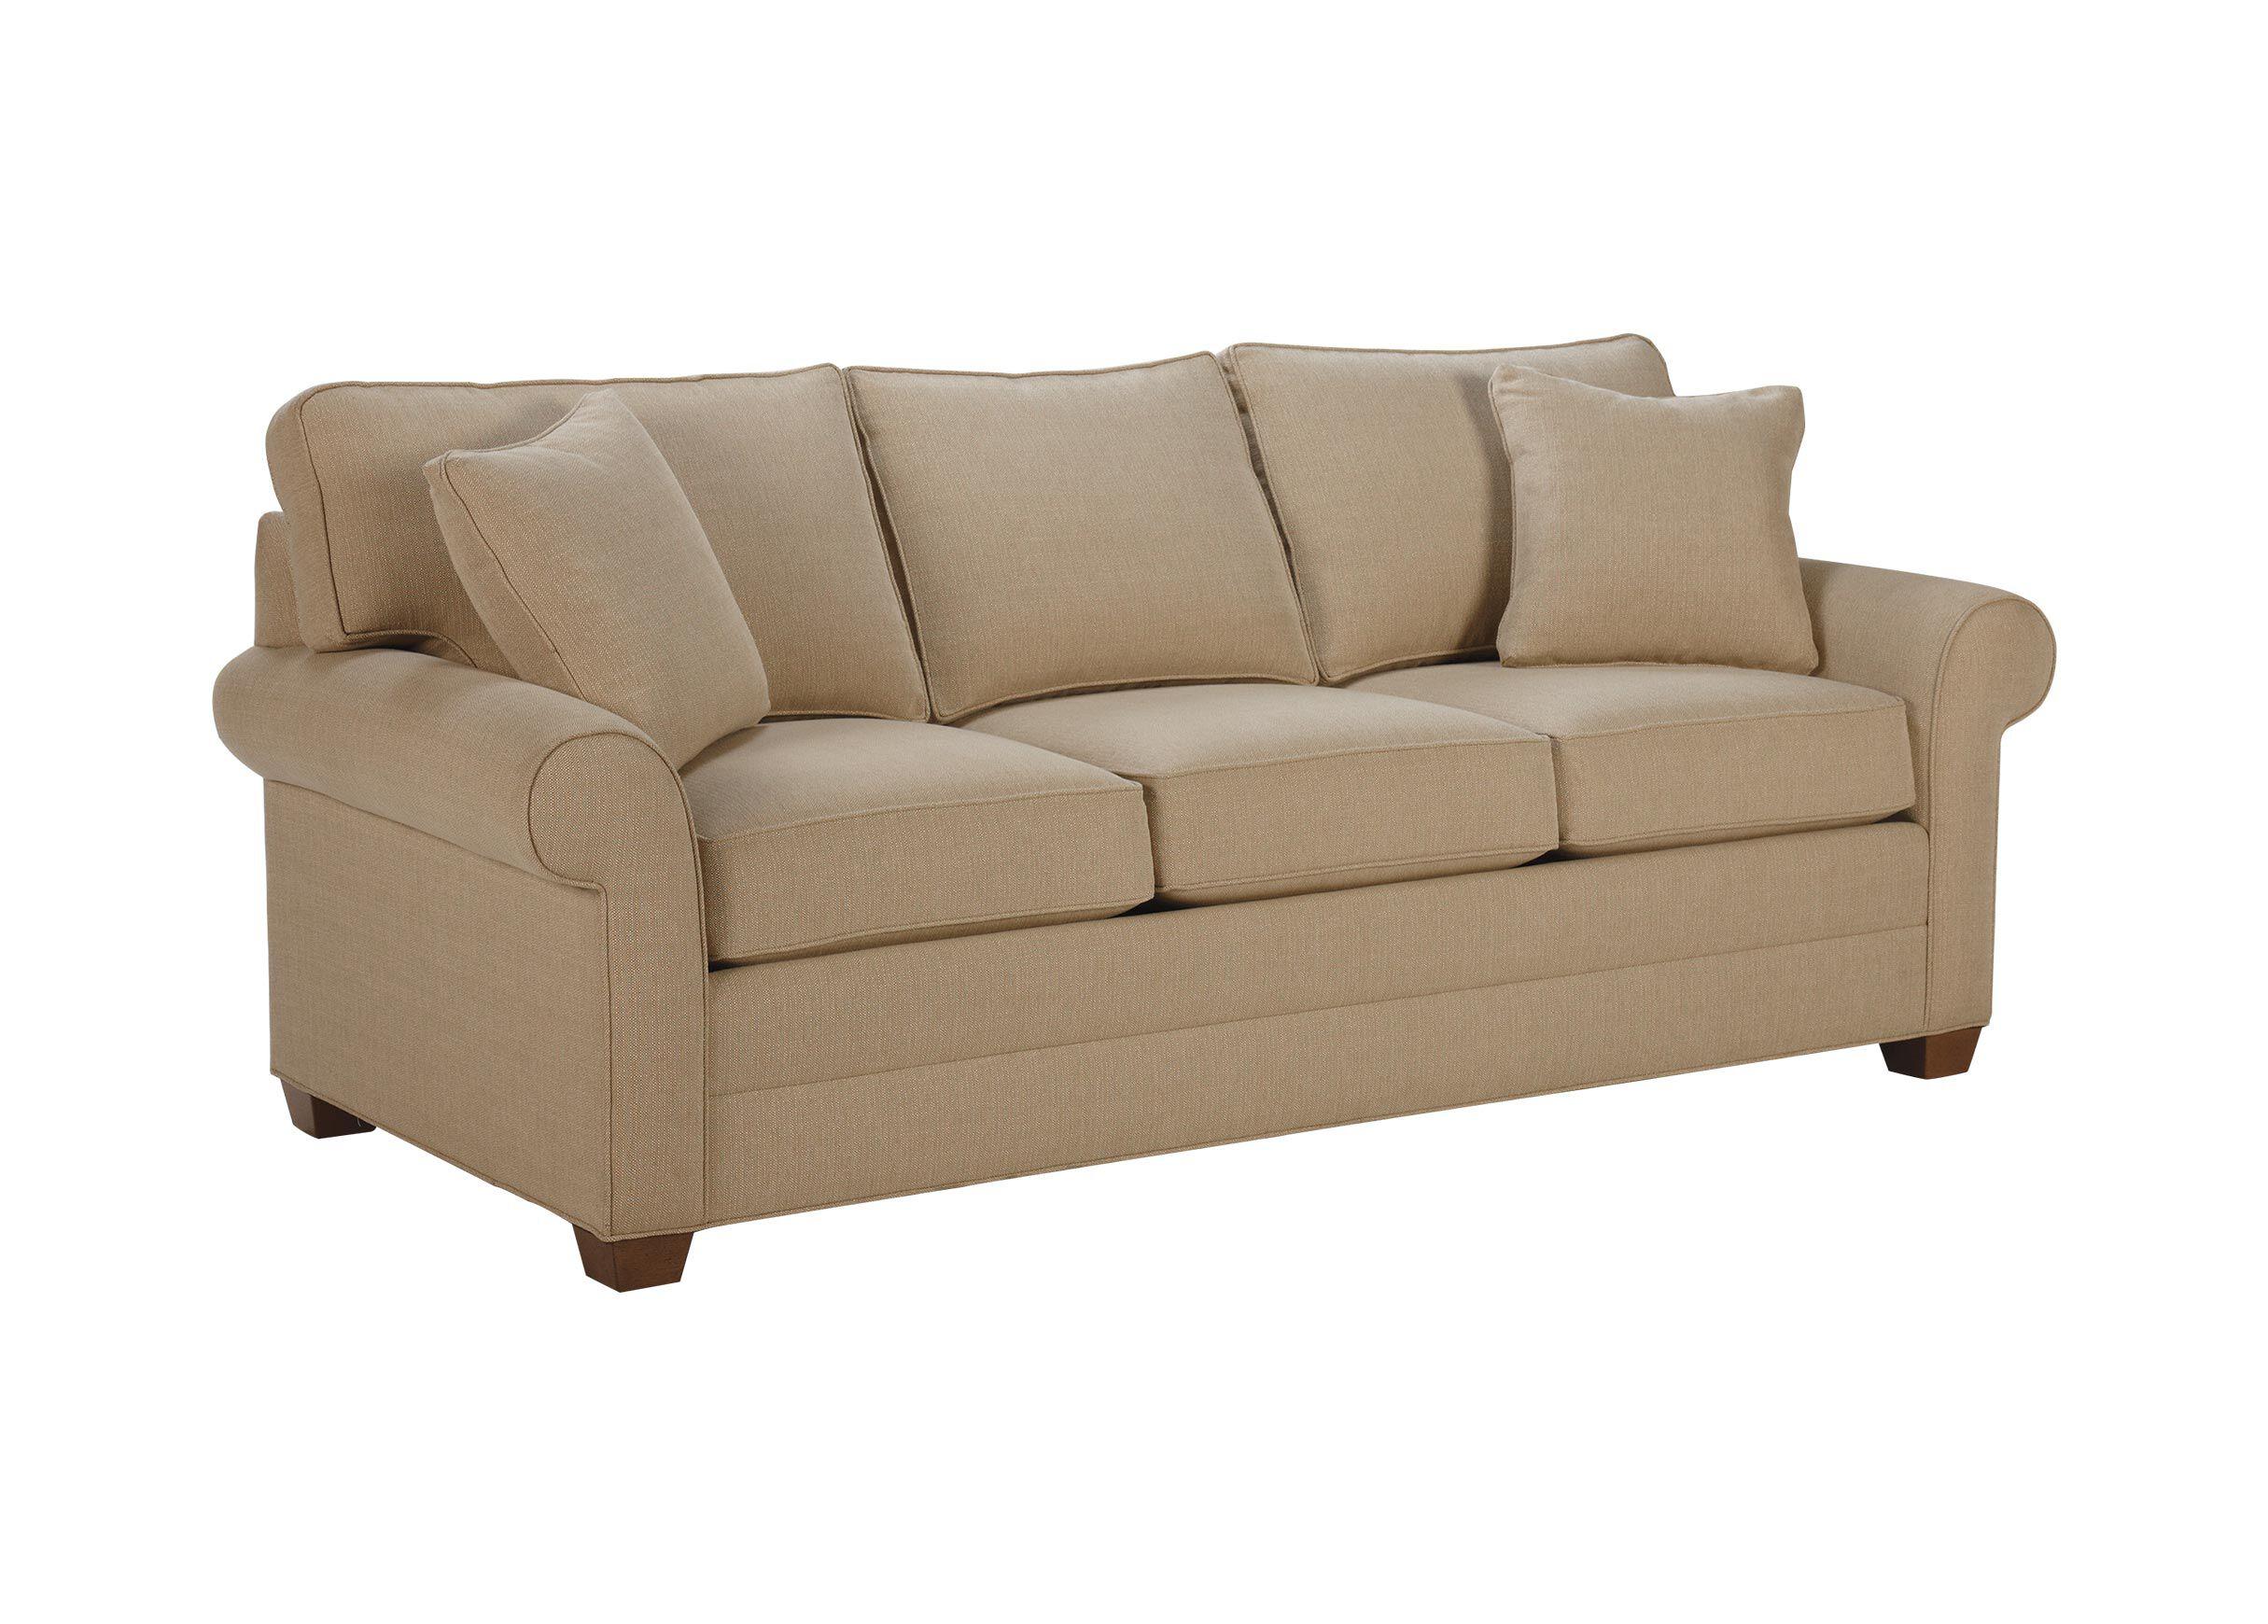 roll arm sofa canada gray leather recliner bennett loveseat ethan allen